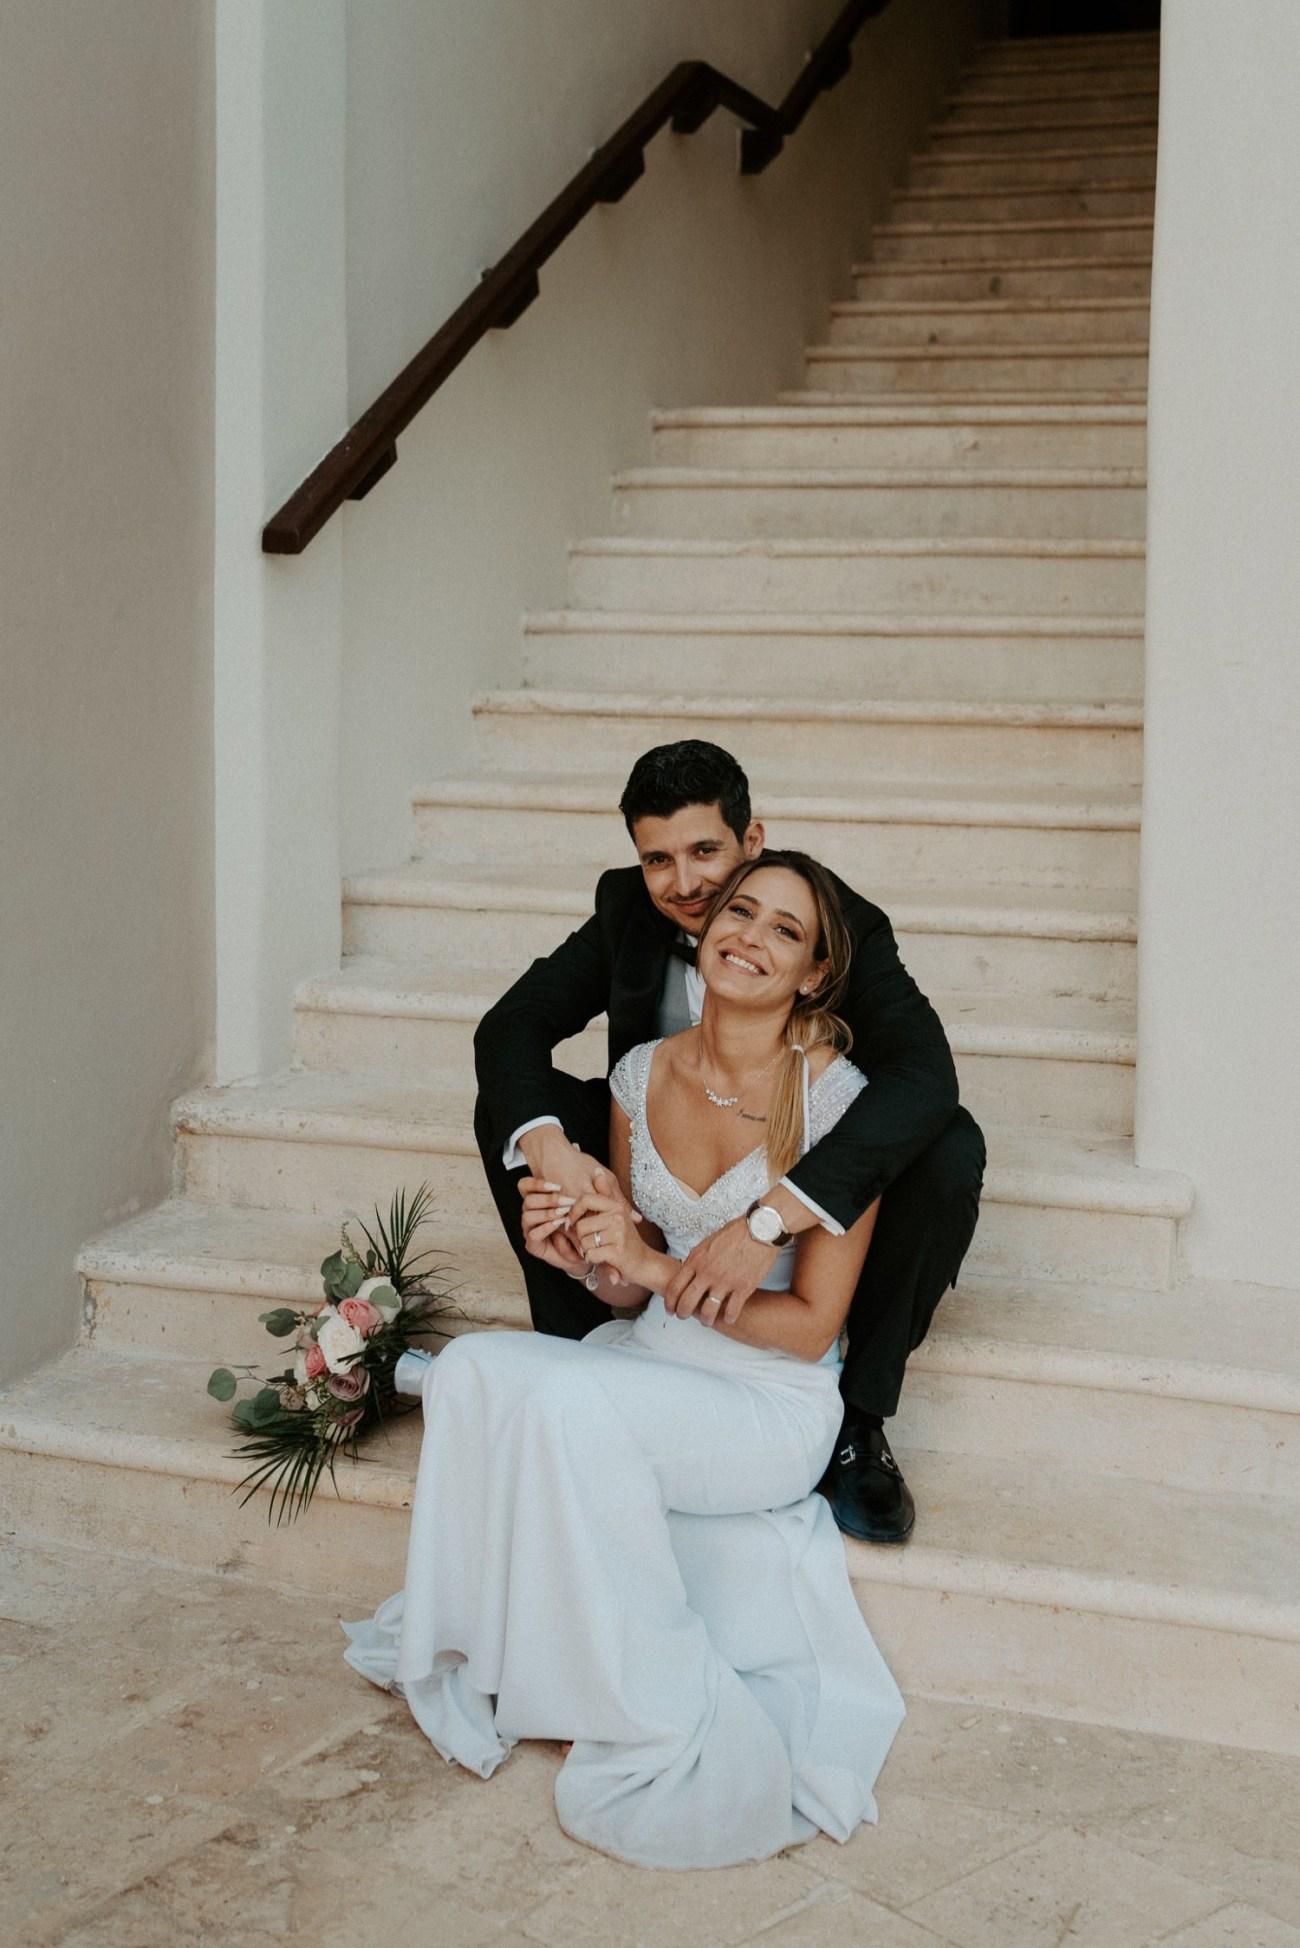 Cancun Destination Wedding Mexico Tulum Wedding Photographer Anais Possamai Photography 051